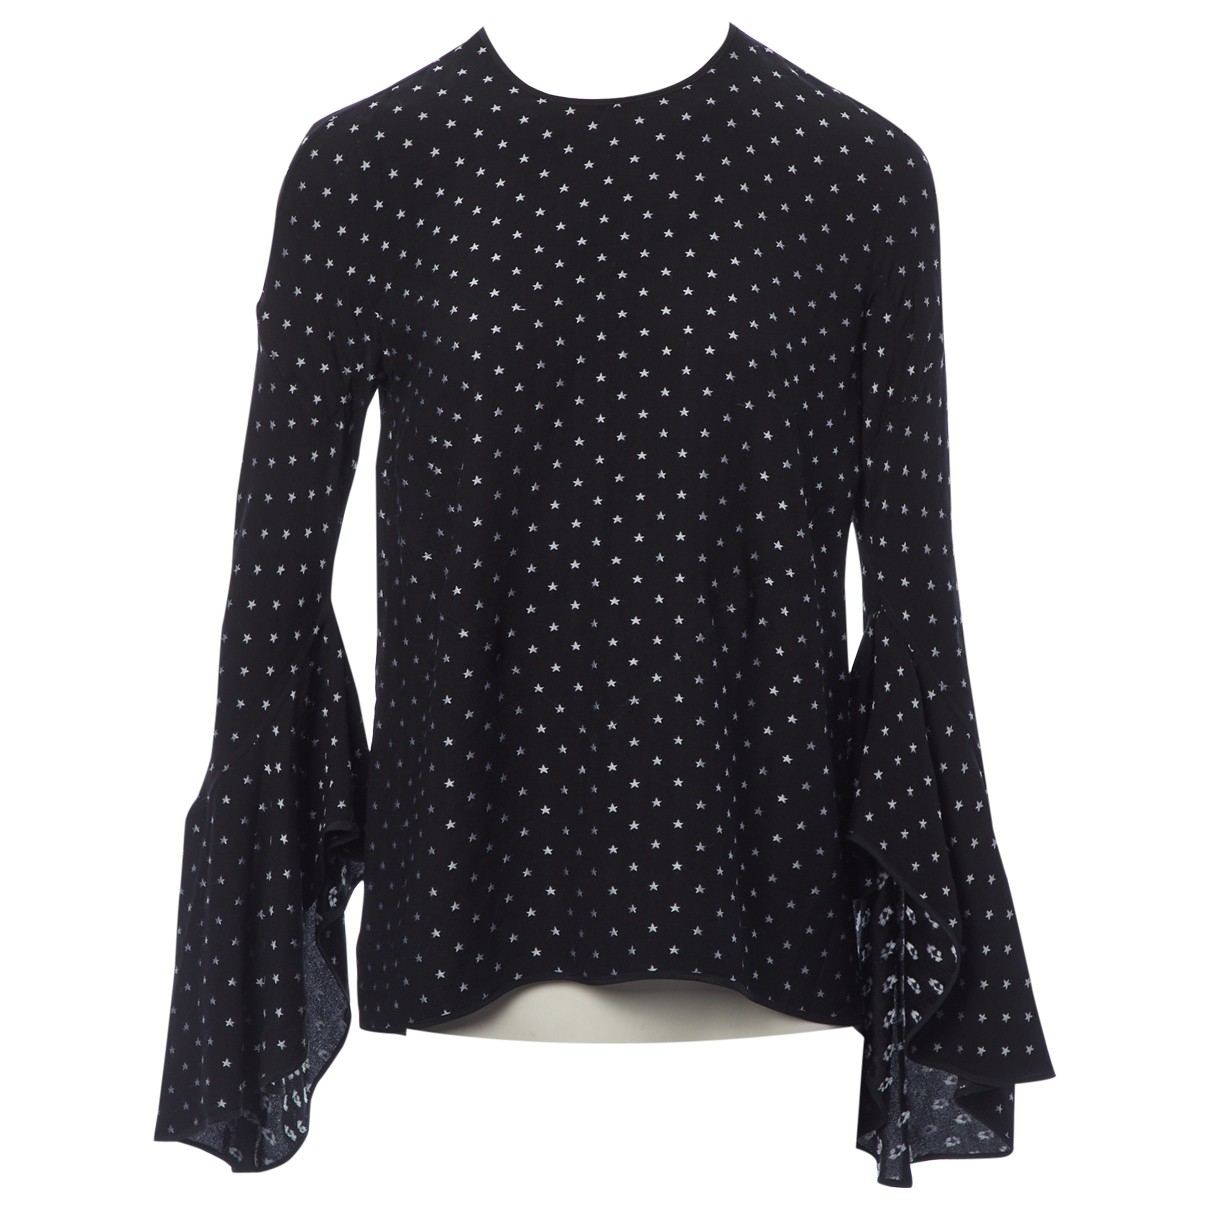 Givenchy \N Top in  Schwarz Seide